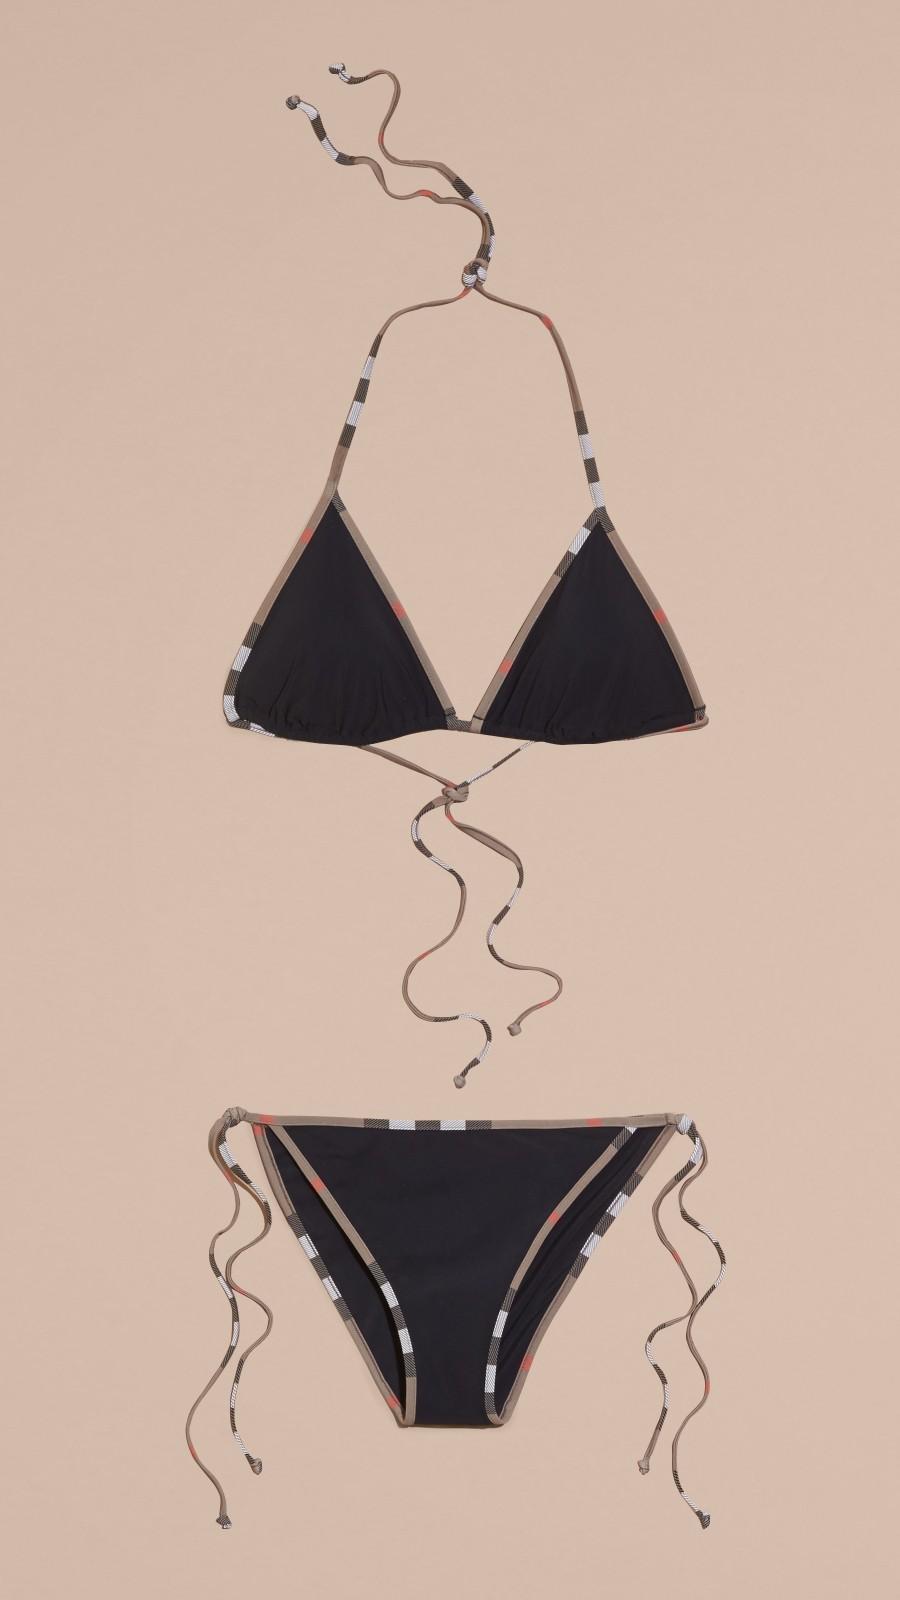 Black Check Trim Triangle Bikini Black - Image 4